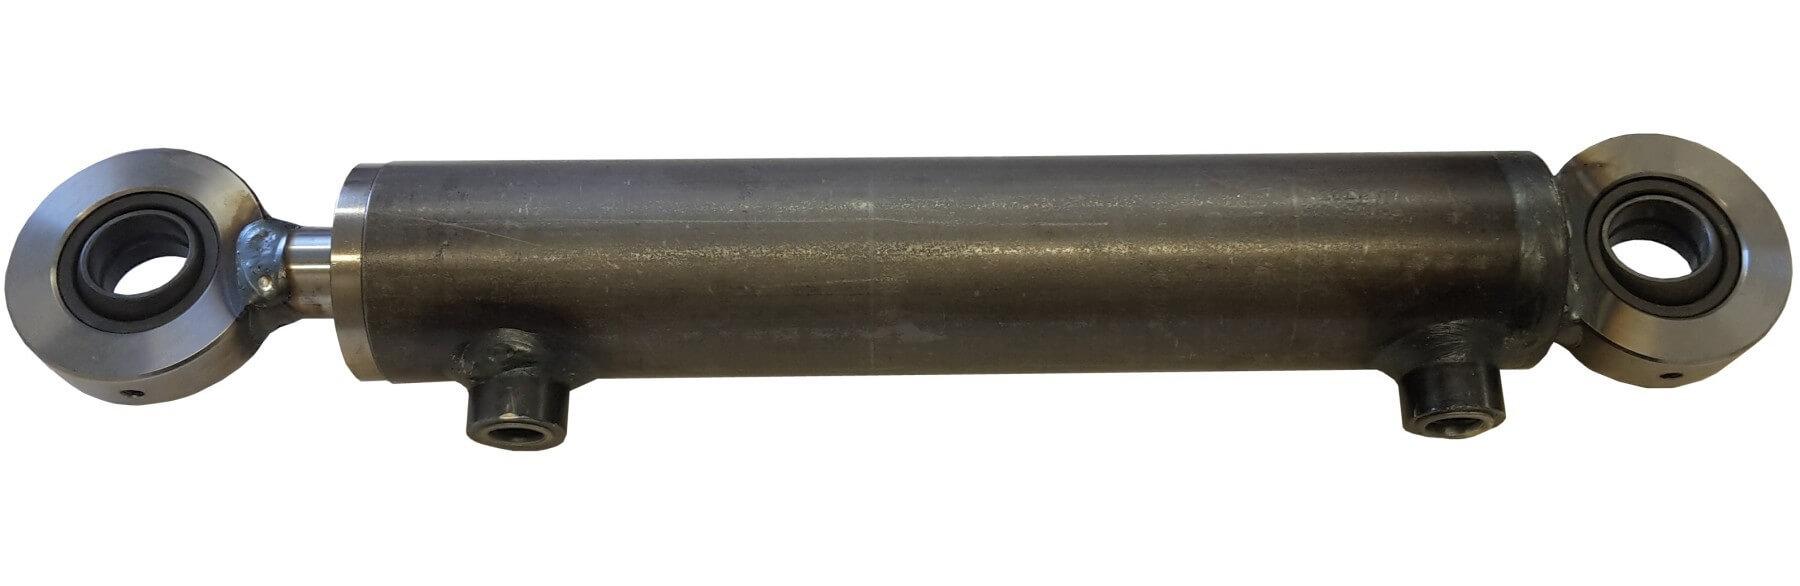 Hydraulisylinteri CL 50. 25. 200 GE